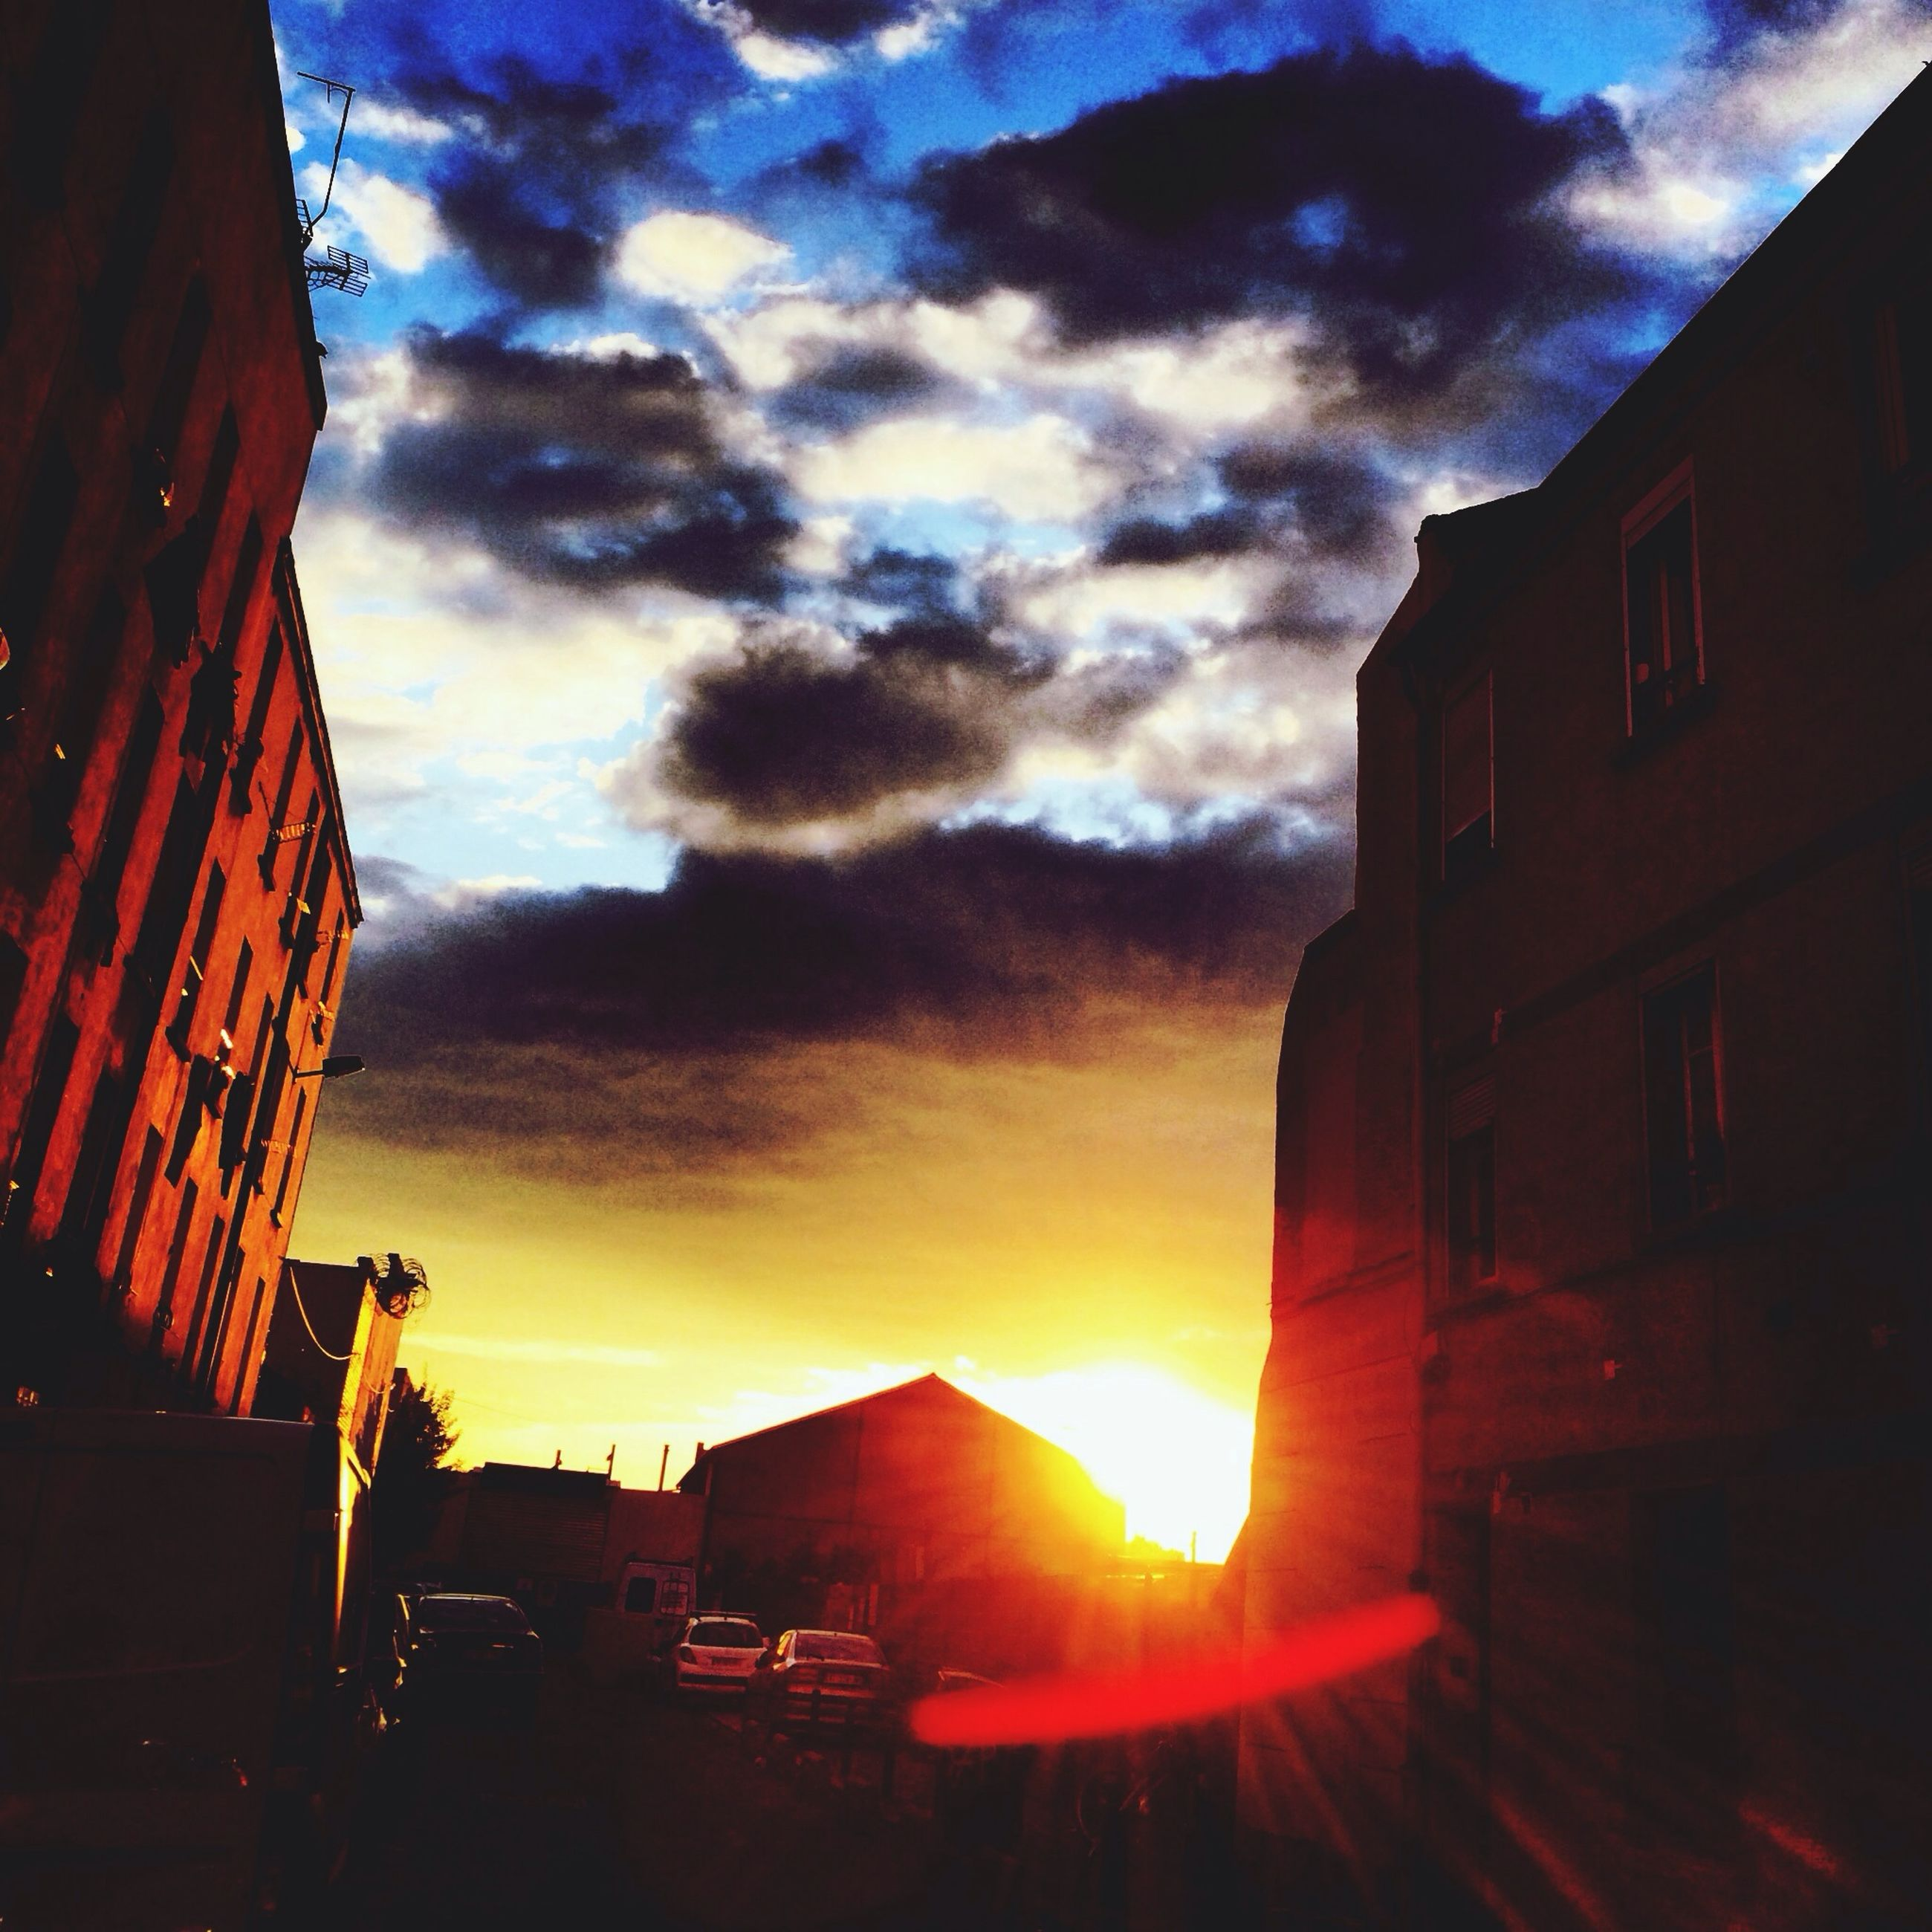 building exterior, sunset, architecture, built structure, sky, cloud - sky, sun, sunbeam, house, sunlight, residential structure, orange color, cloud, cloudy, residential building, city, building, car, outdoors, low angle view